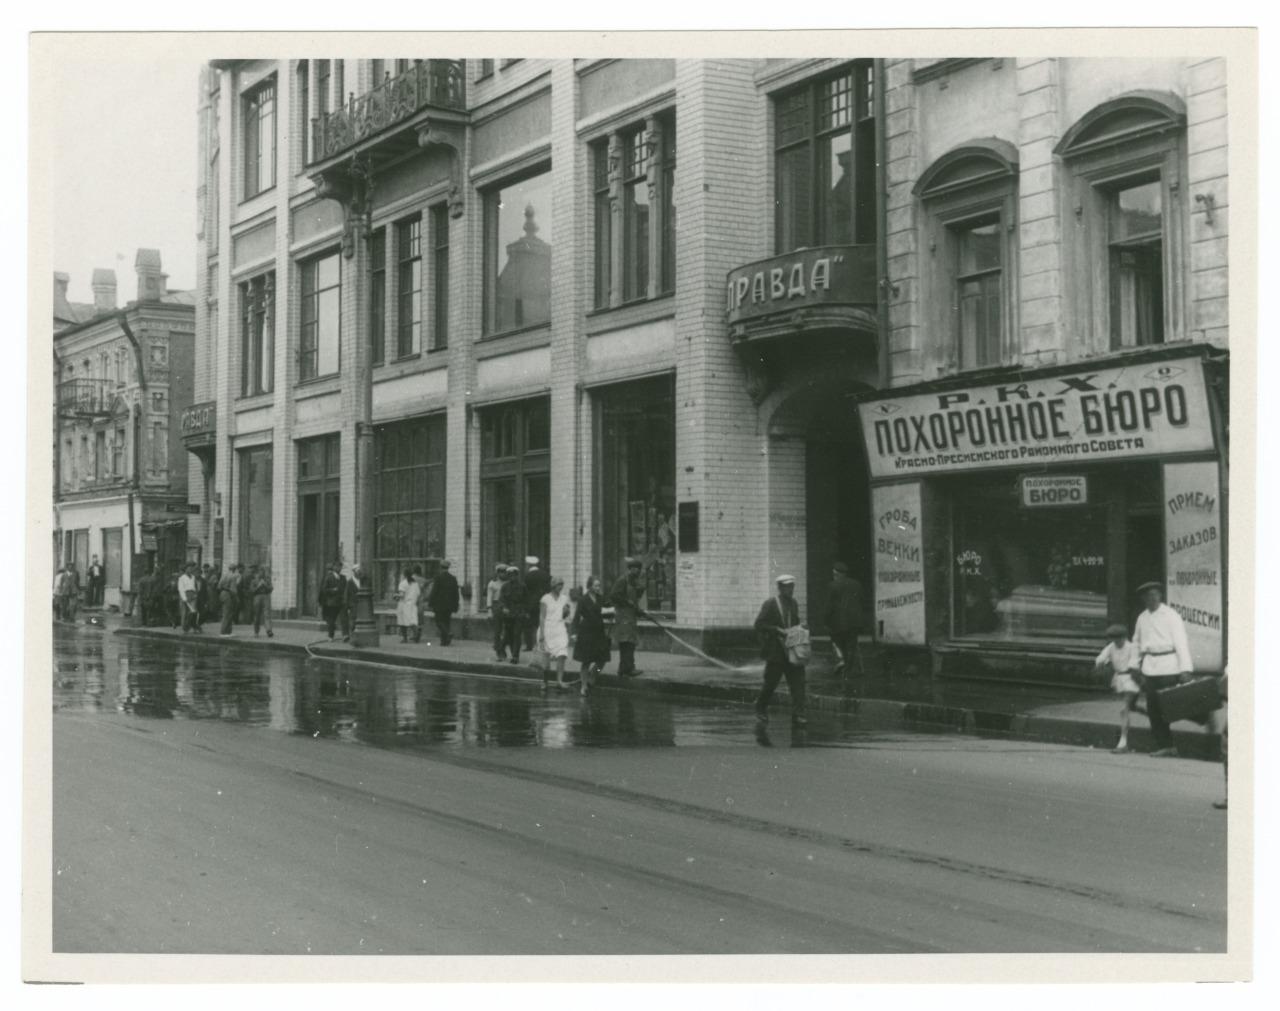 The publishing house of Pravda and a funeral bureau on Tverskaya Street, Moscow; 1930.jpg